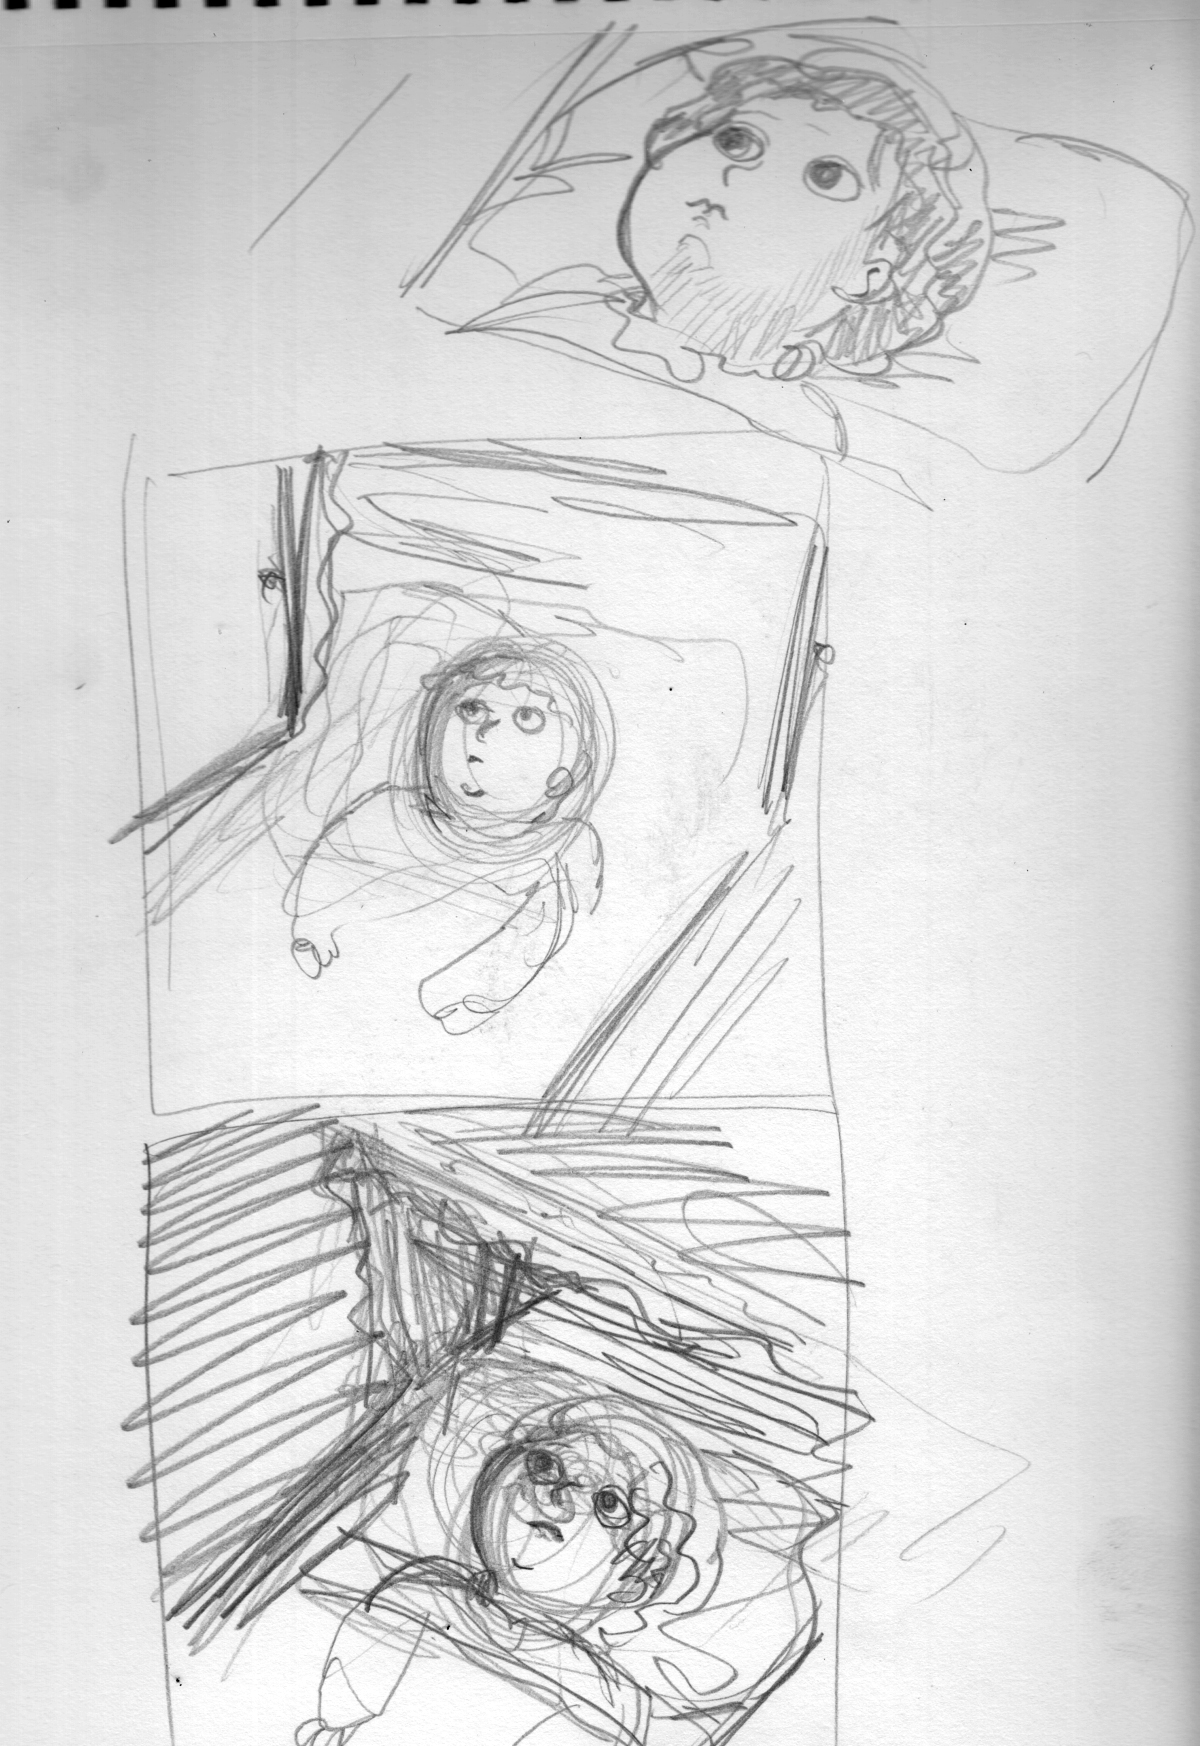 7-16 pram sketch4